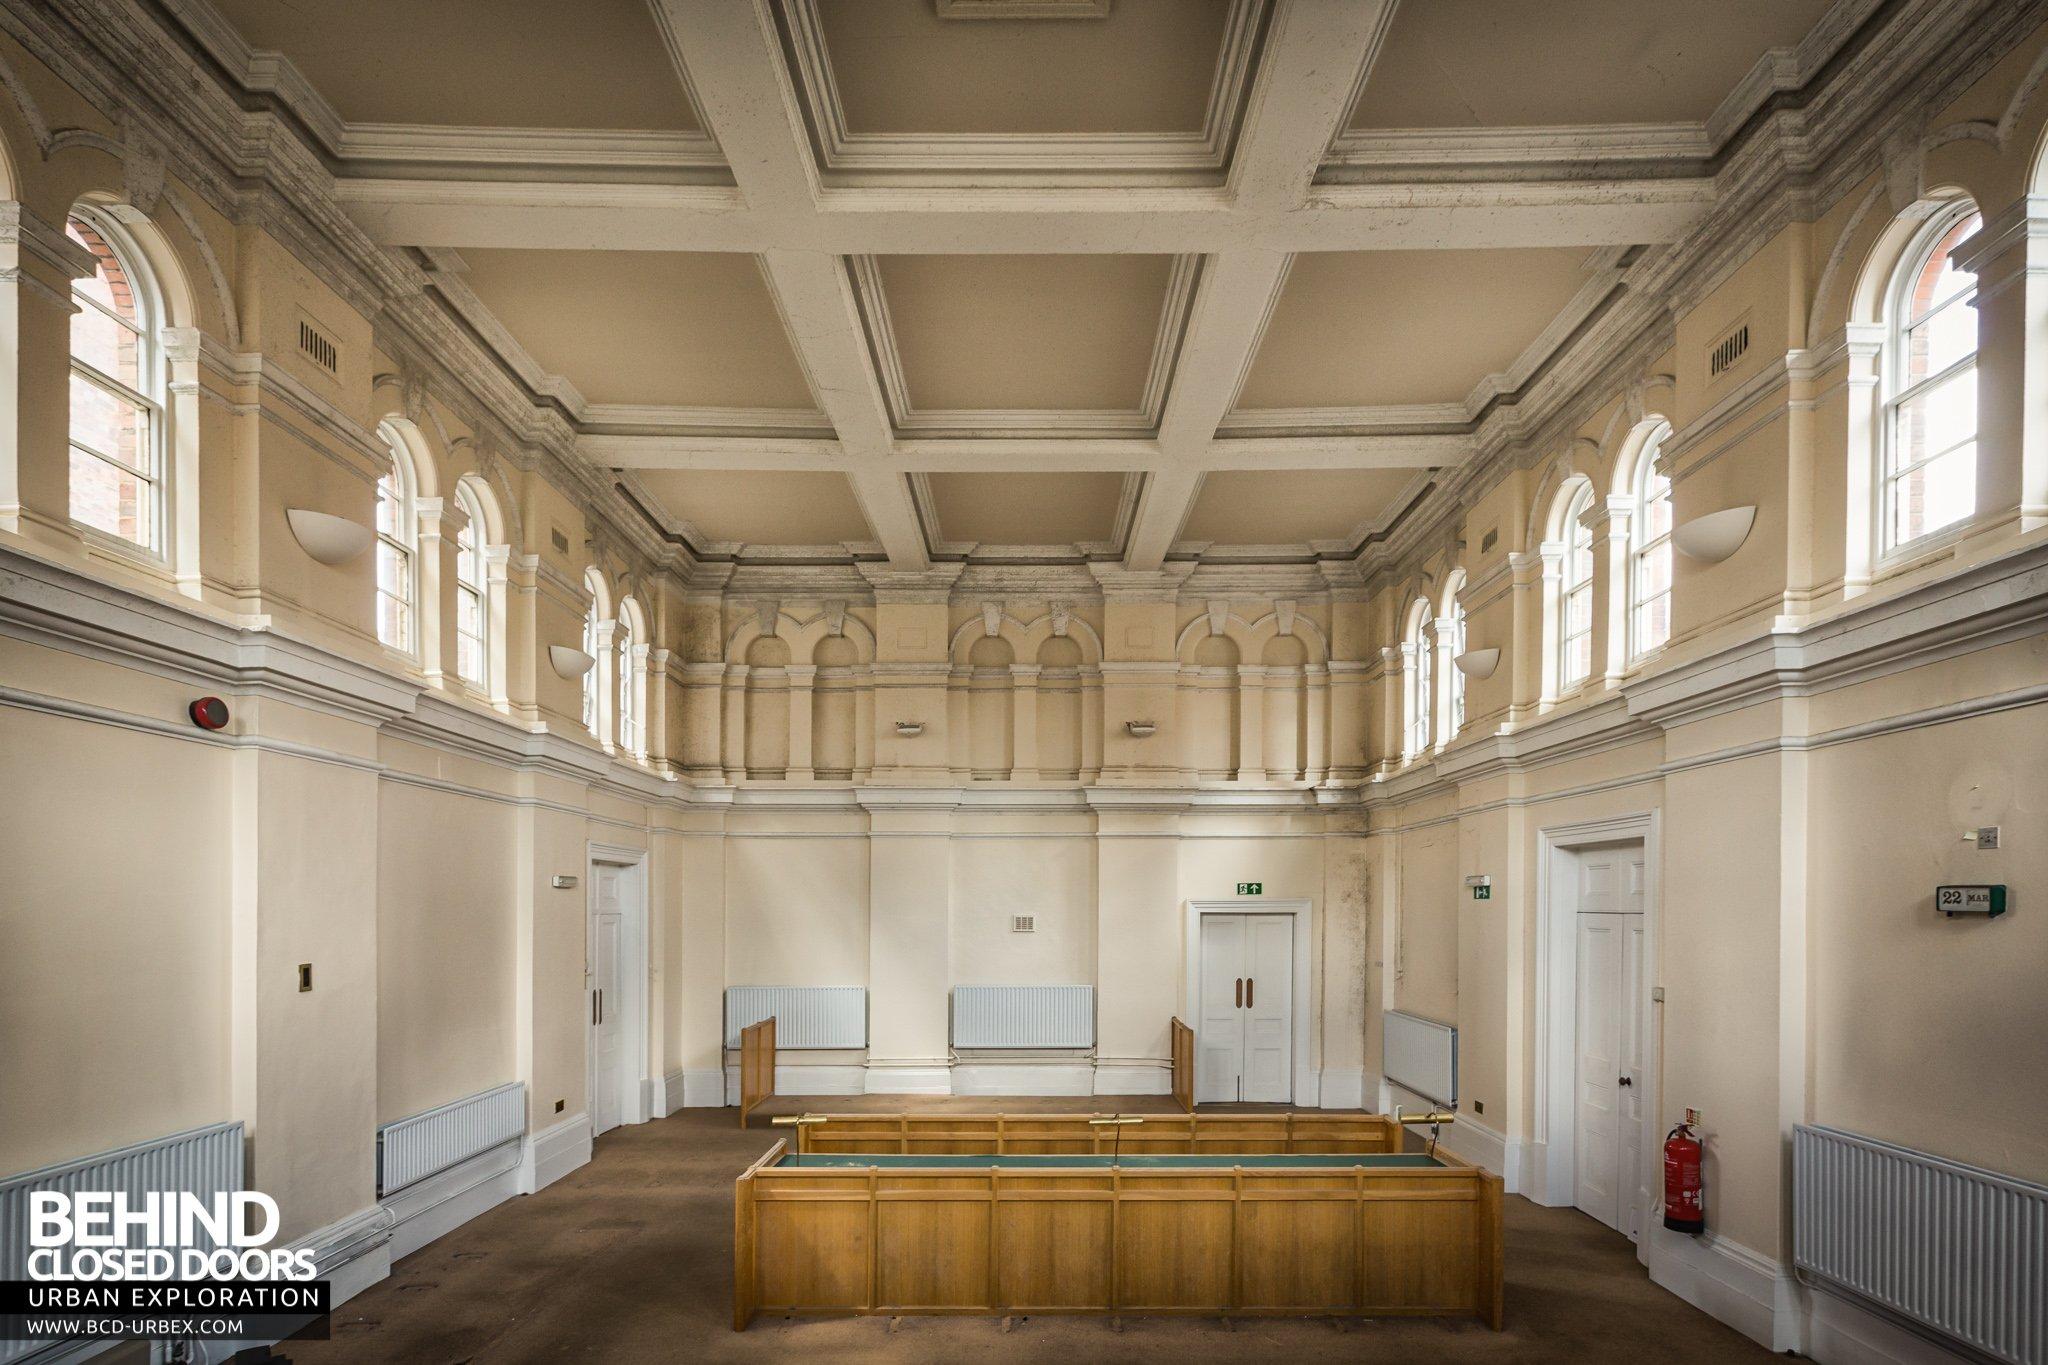 county-court-burton-upon-trent-5.jpg